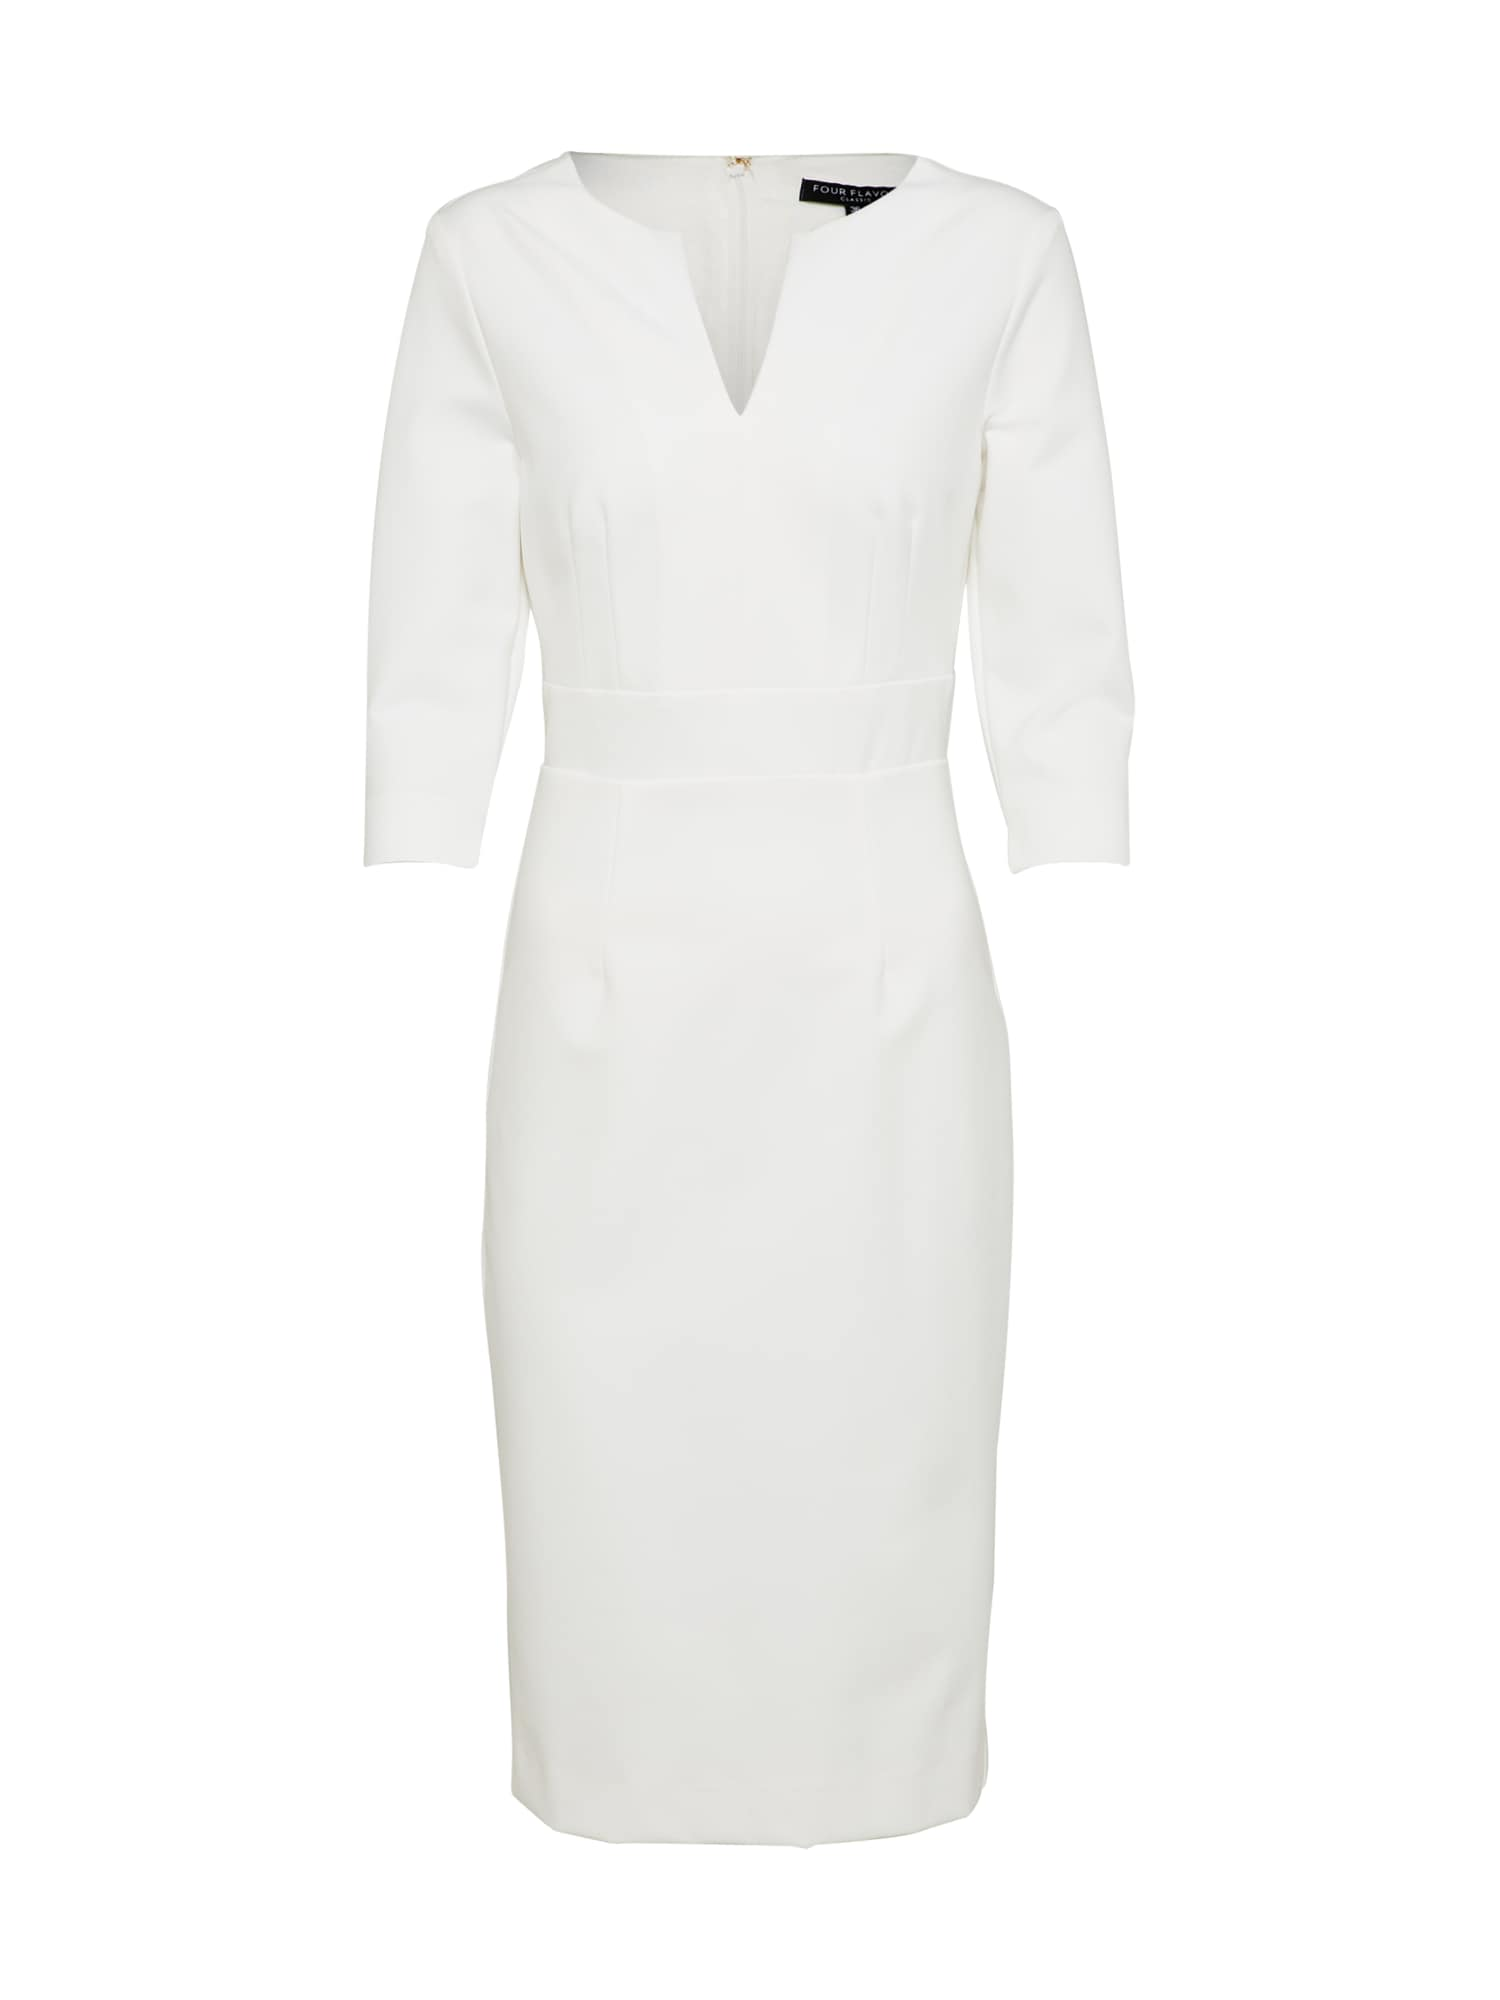 Pouzdrové šaty LETIZIA offwhite Four Flavor